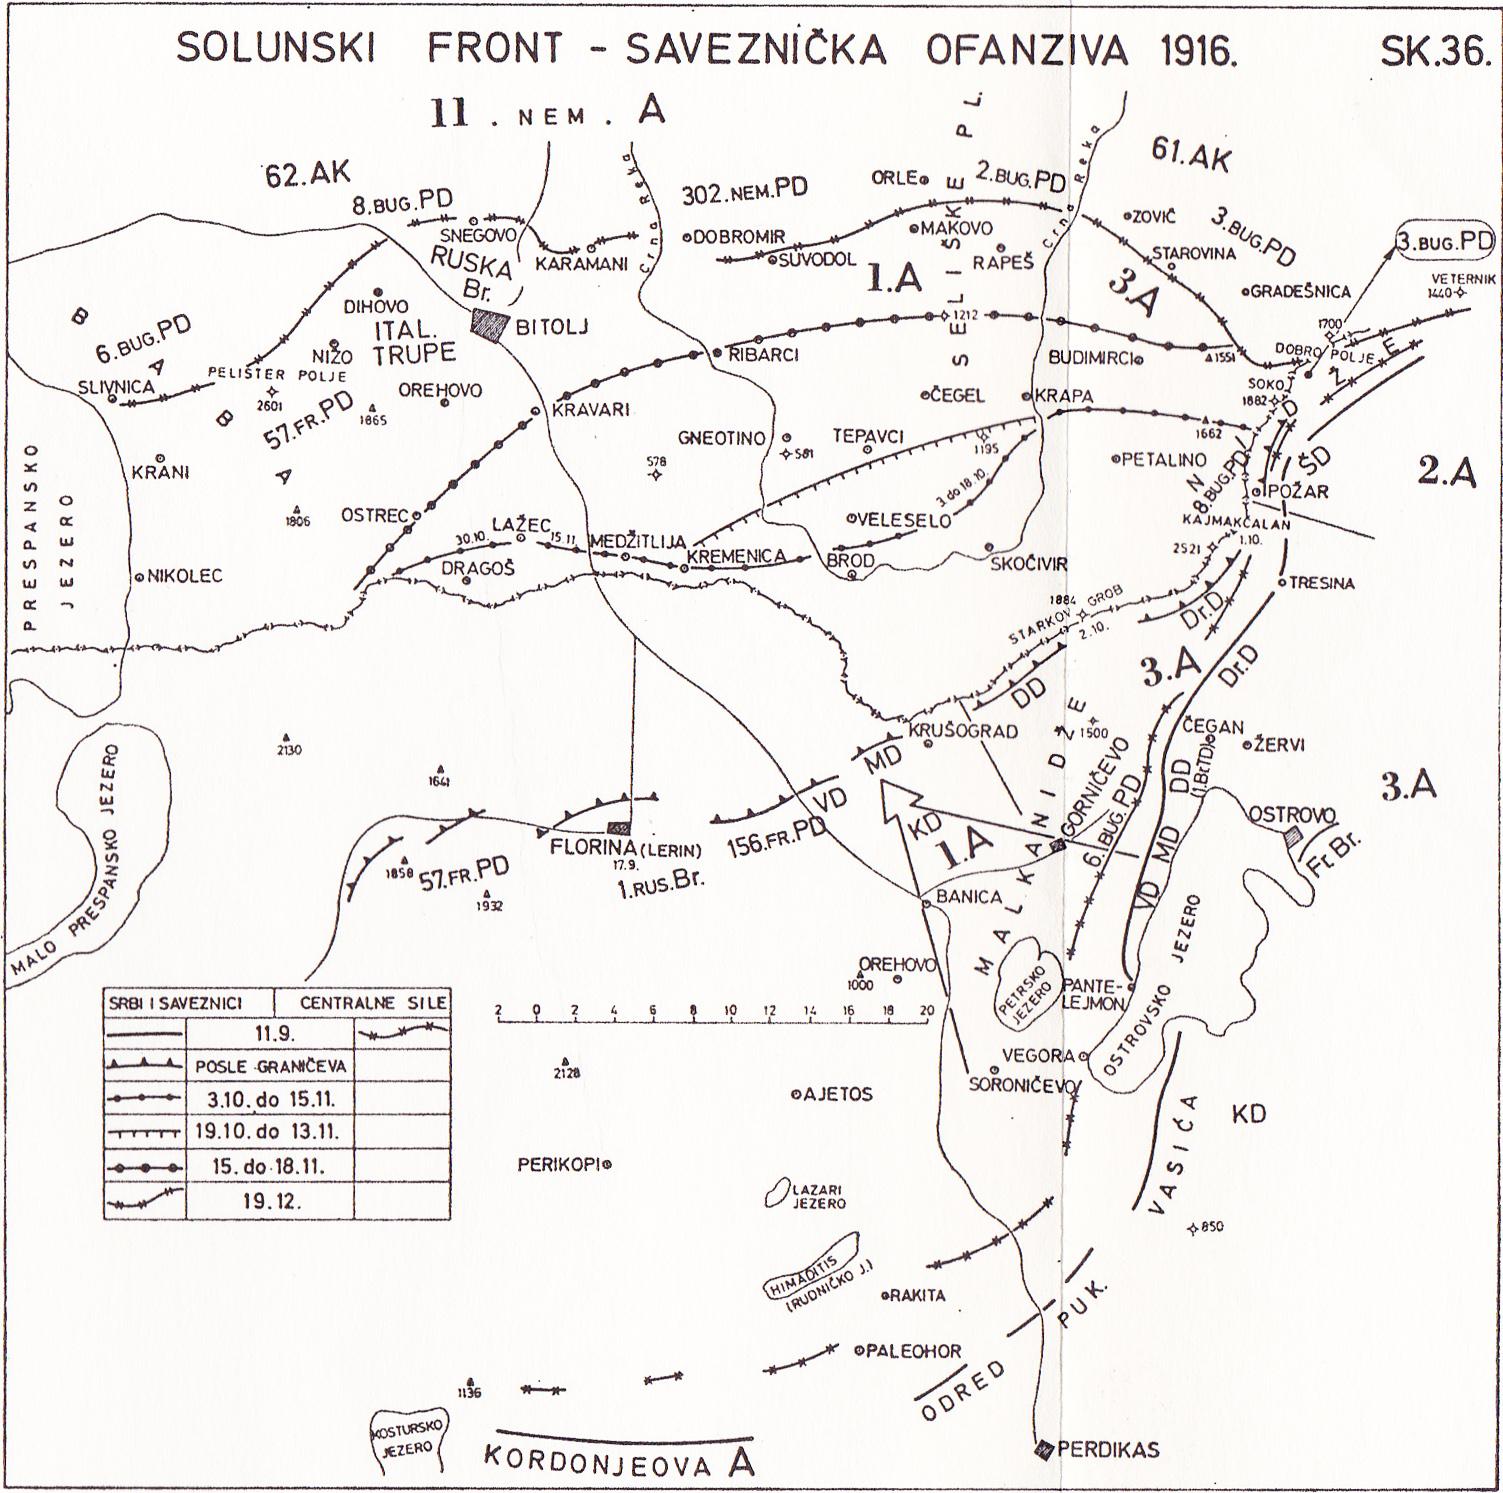 file solunski front ofanziva 1916 wikimedia mons Inage sRGB file solunski front ofanziva 1916